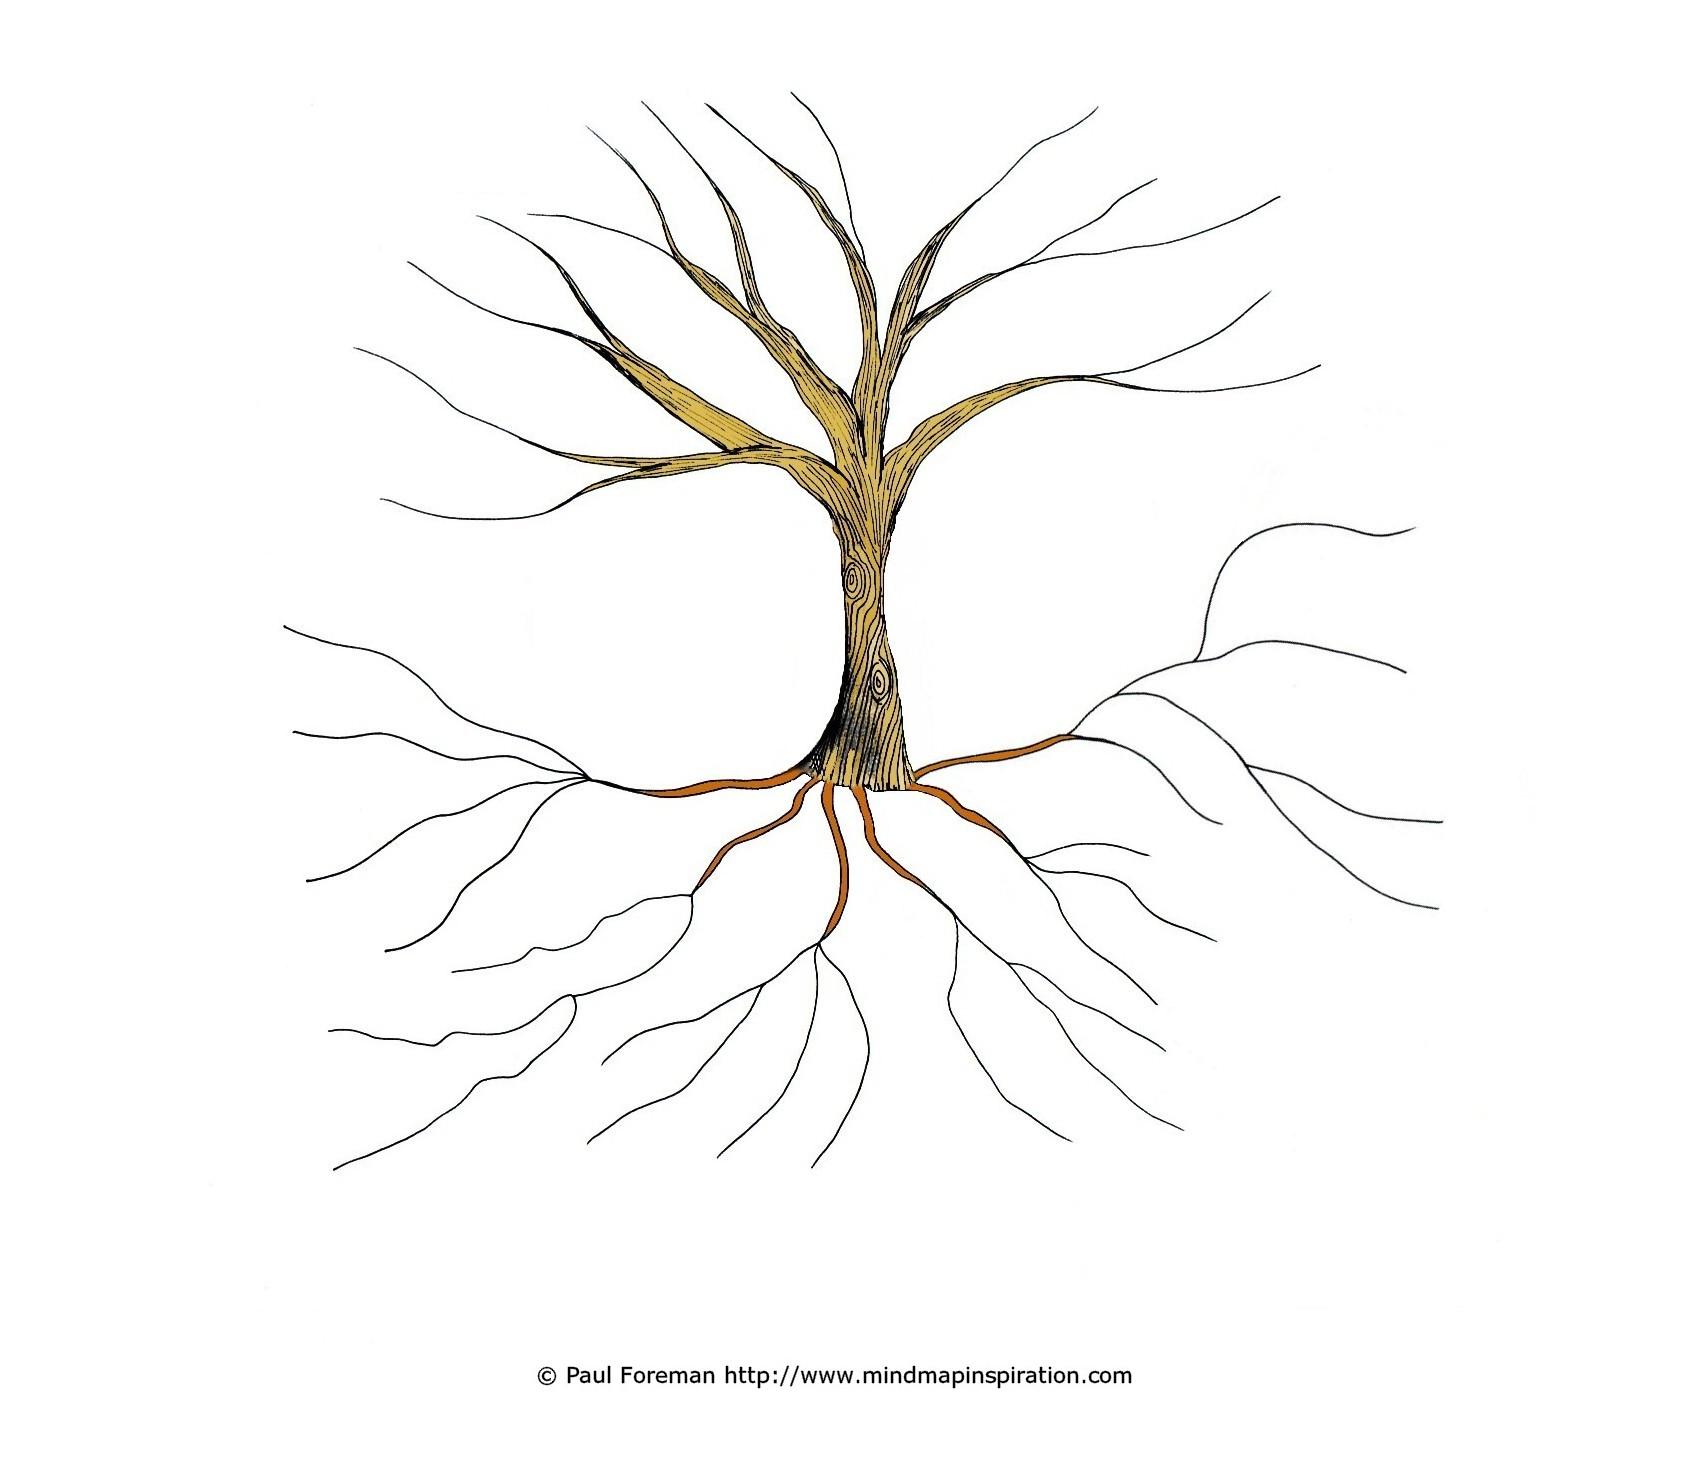 blank tree diagram graphic organizer briggs stratton nikki carburetor 2differentiate art